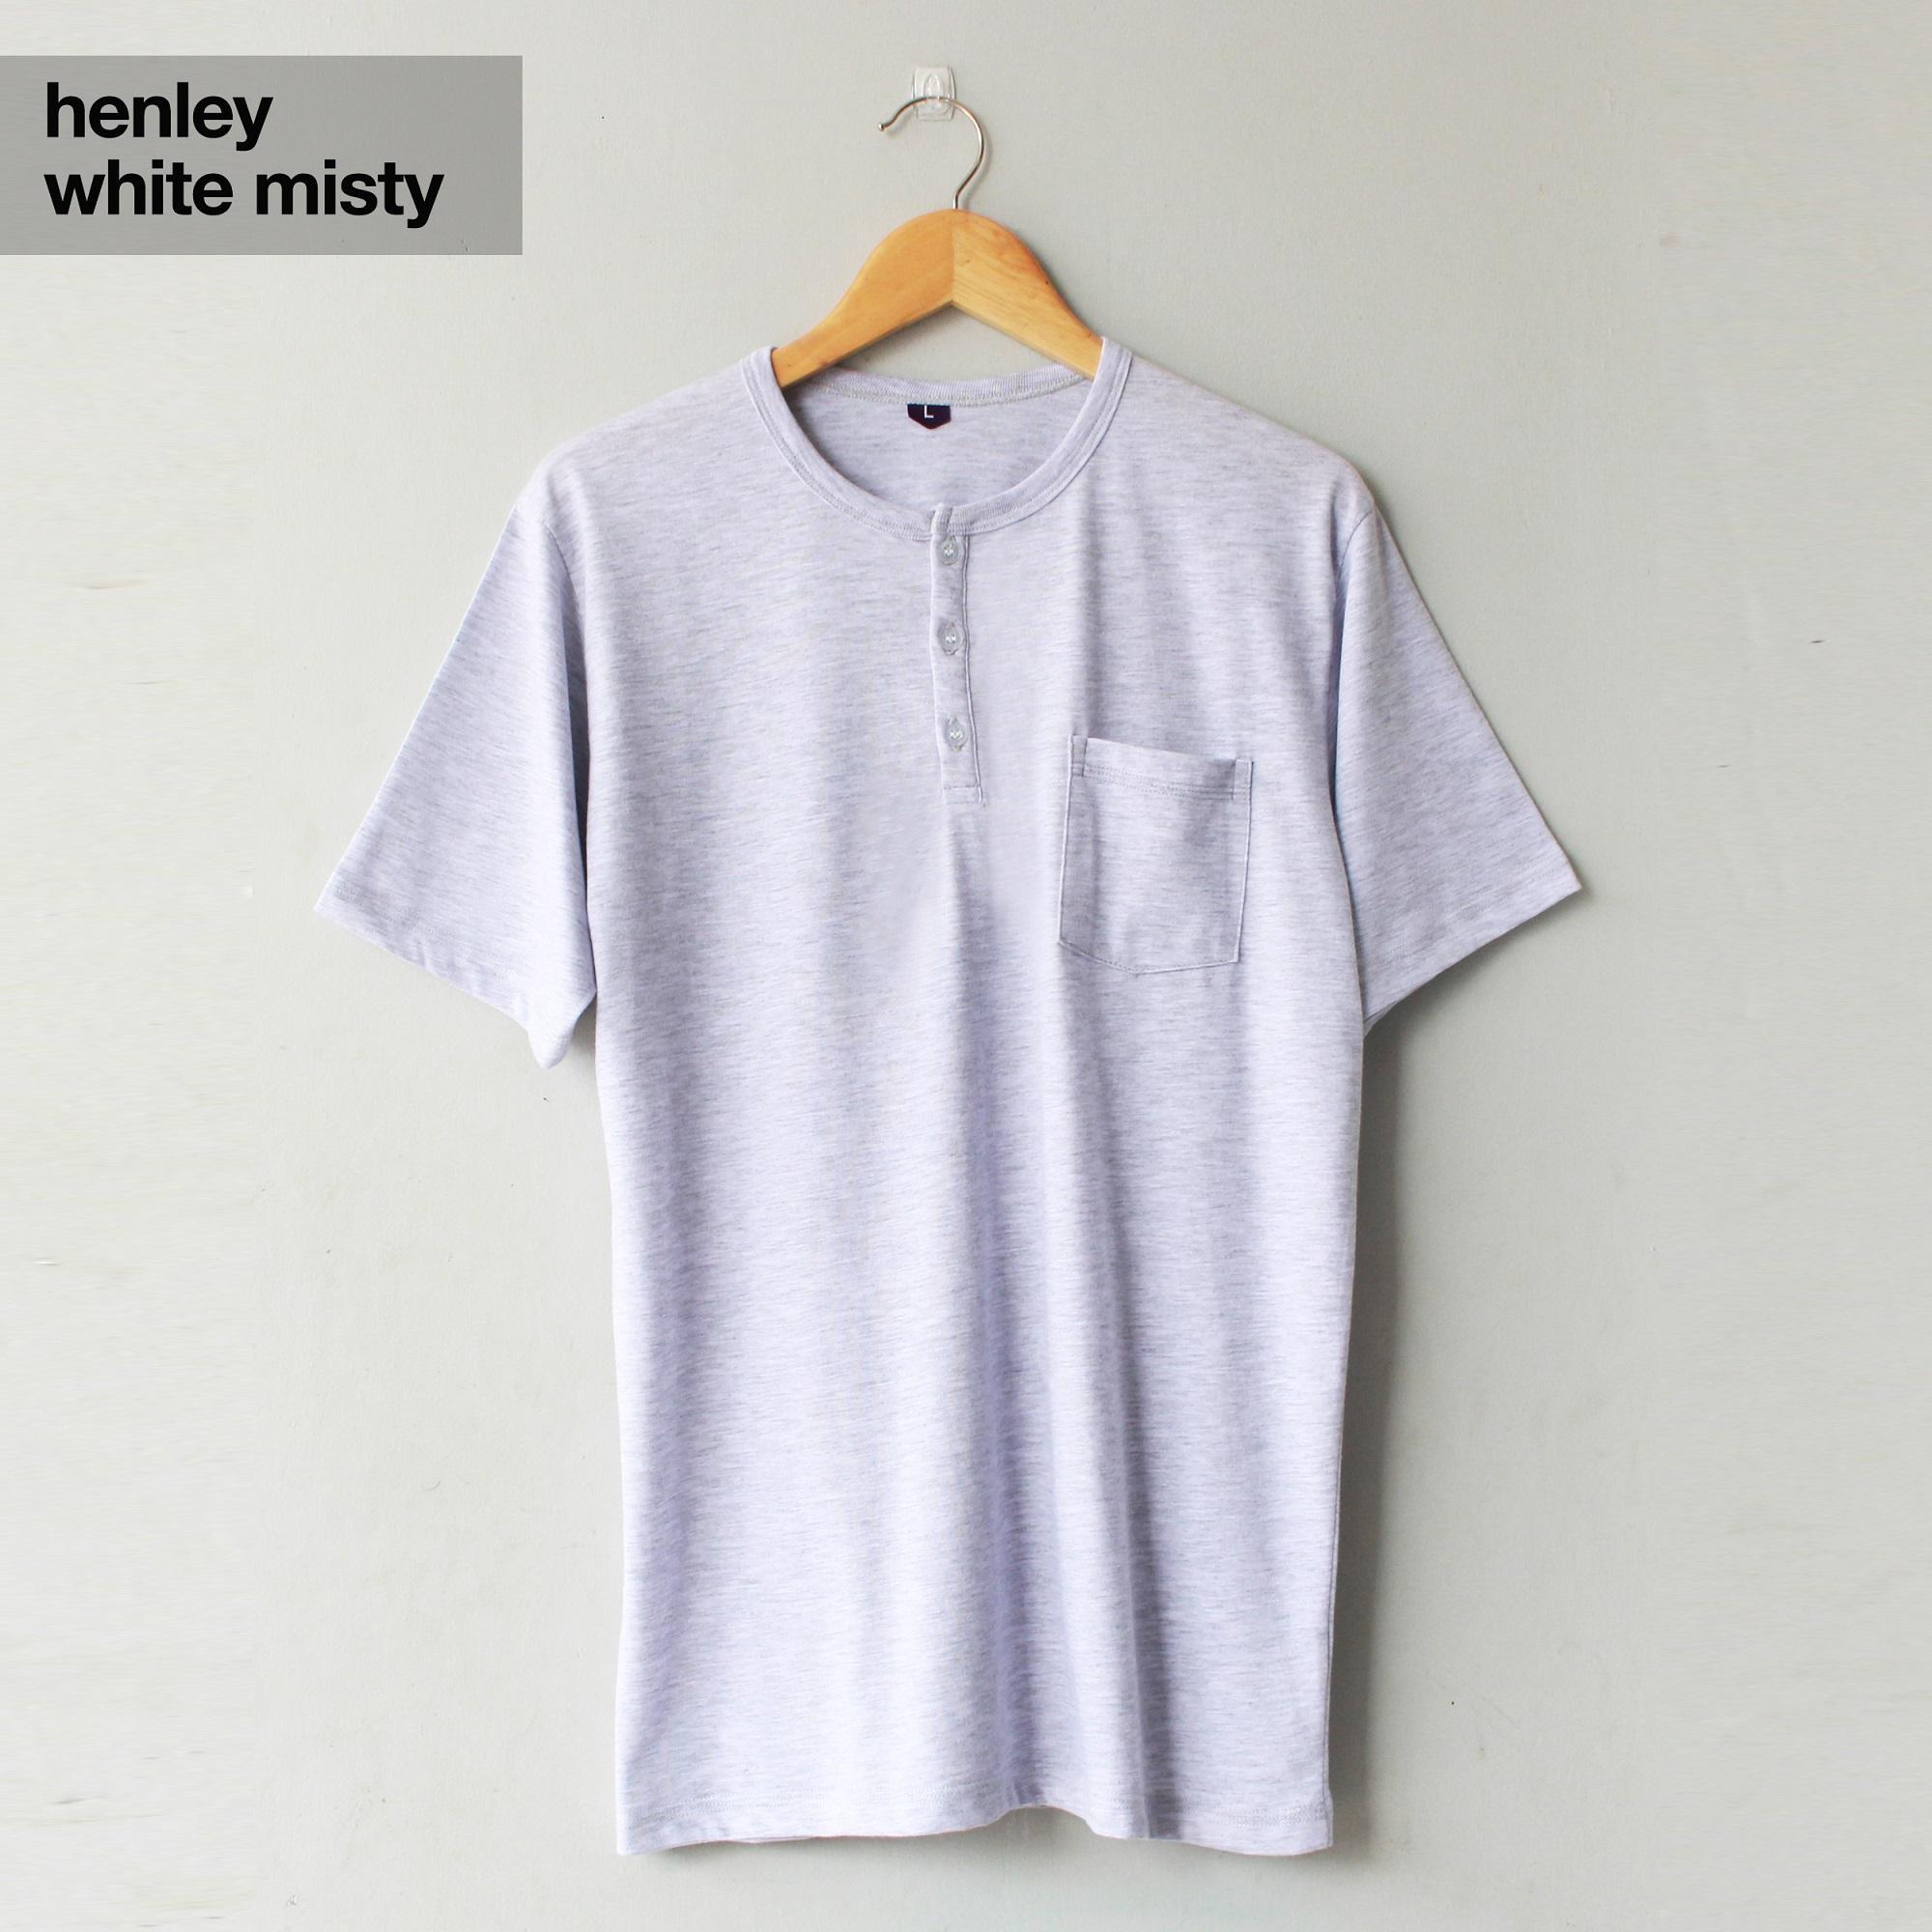 ... POCKET BLACK MISTY / Kaos Tangan Pendek Saku Hitam Misti. Source · Rp 53.000. Kaos Polos Lengan Pendek Baju Henley Untuk Cewek Dan Cowok .